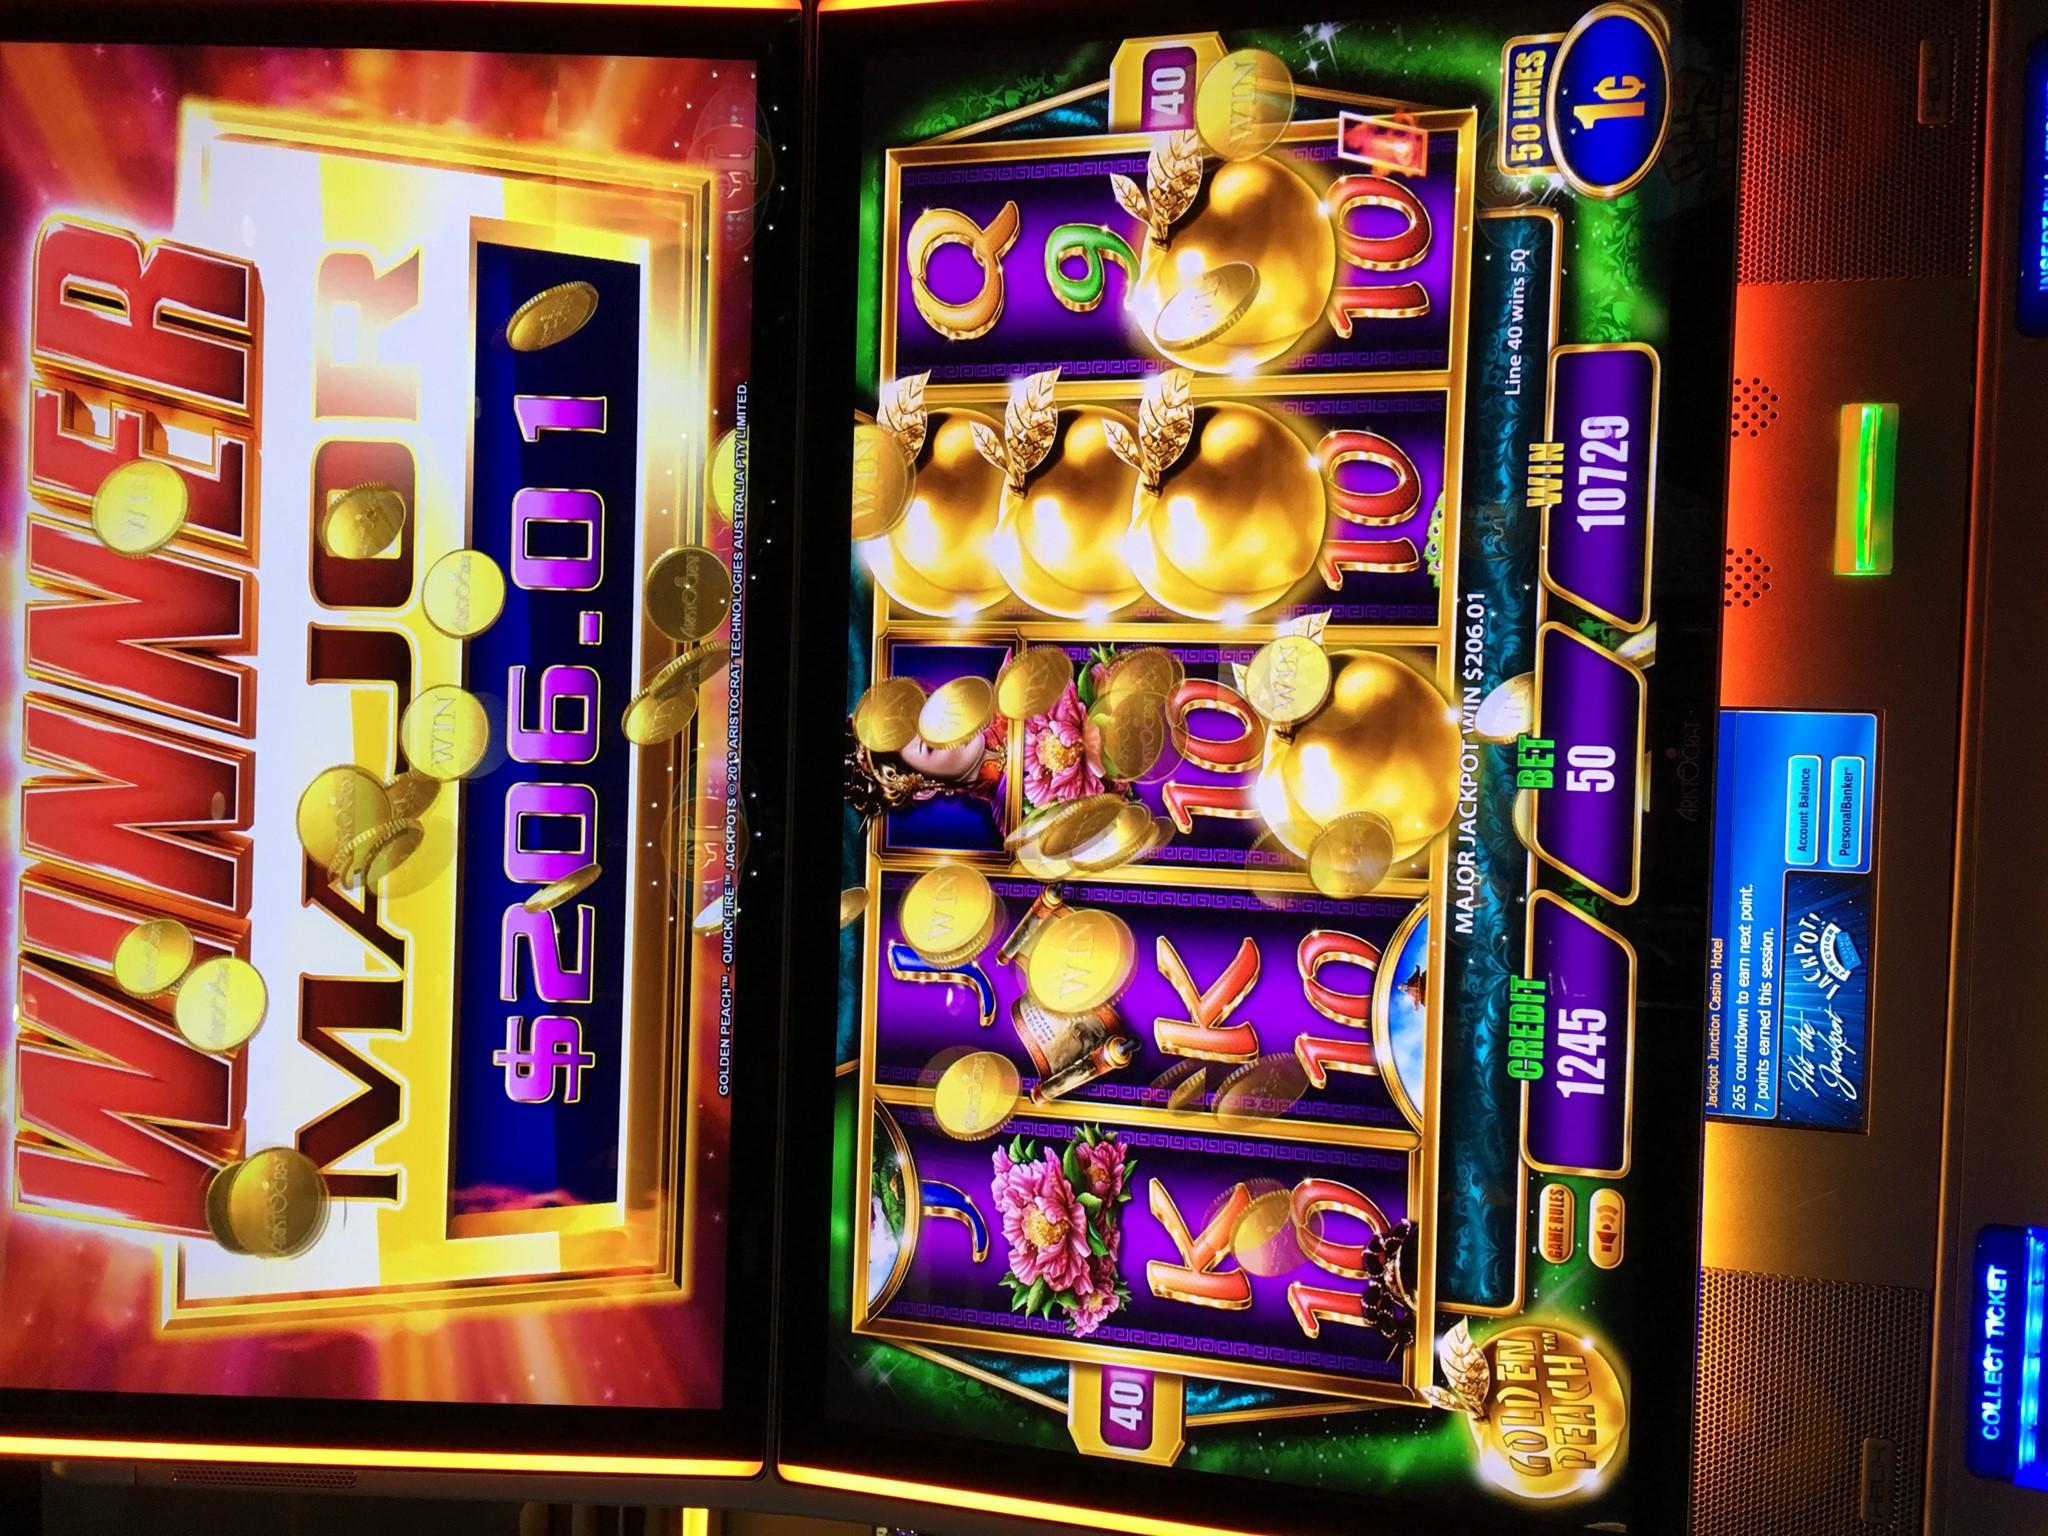 Jackpot Junction Casino Hotel image